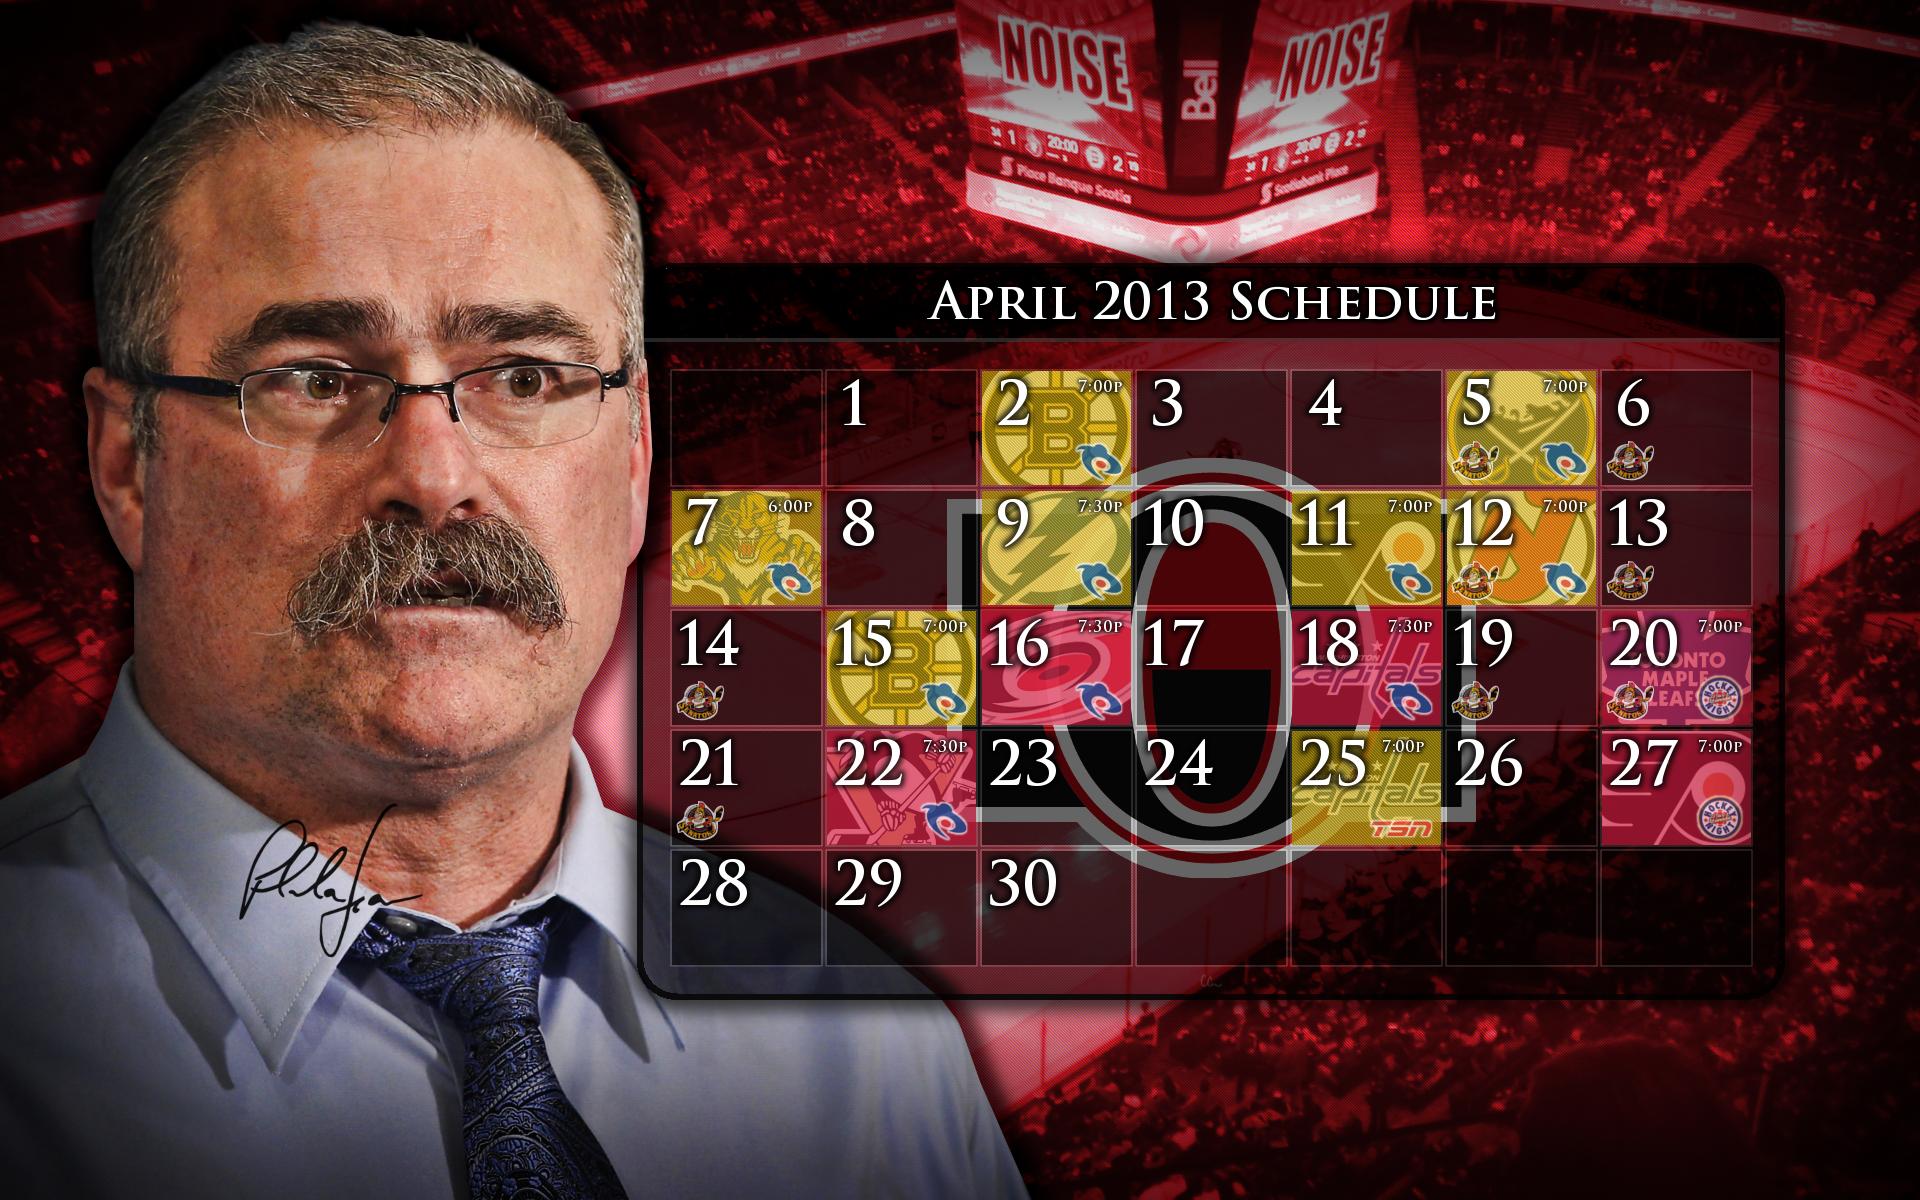 OTT Update: 2012-13 OTT Wallpaper Update: April